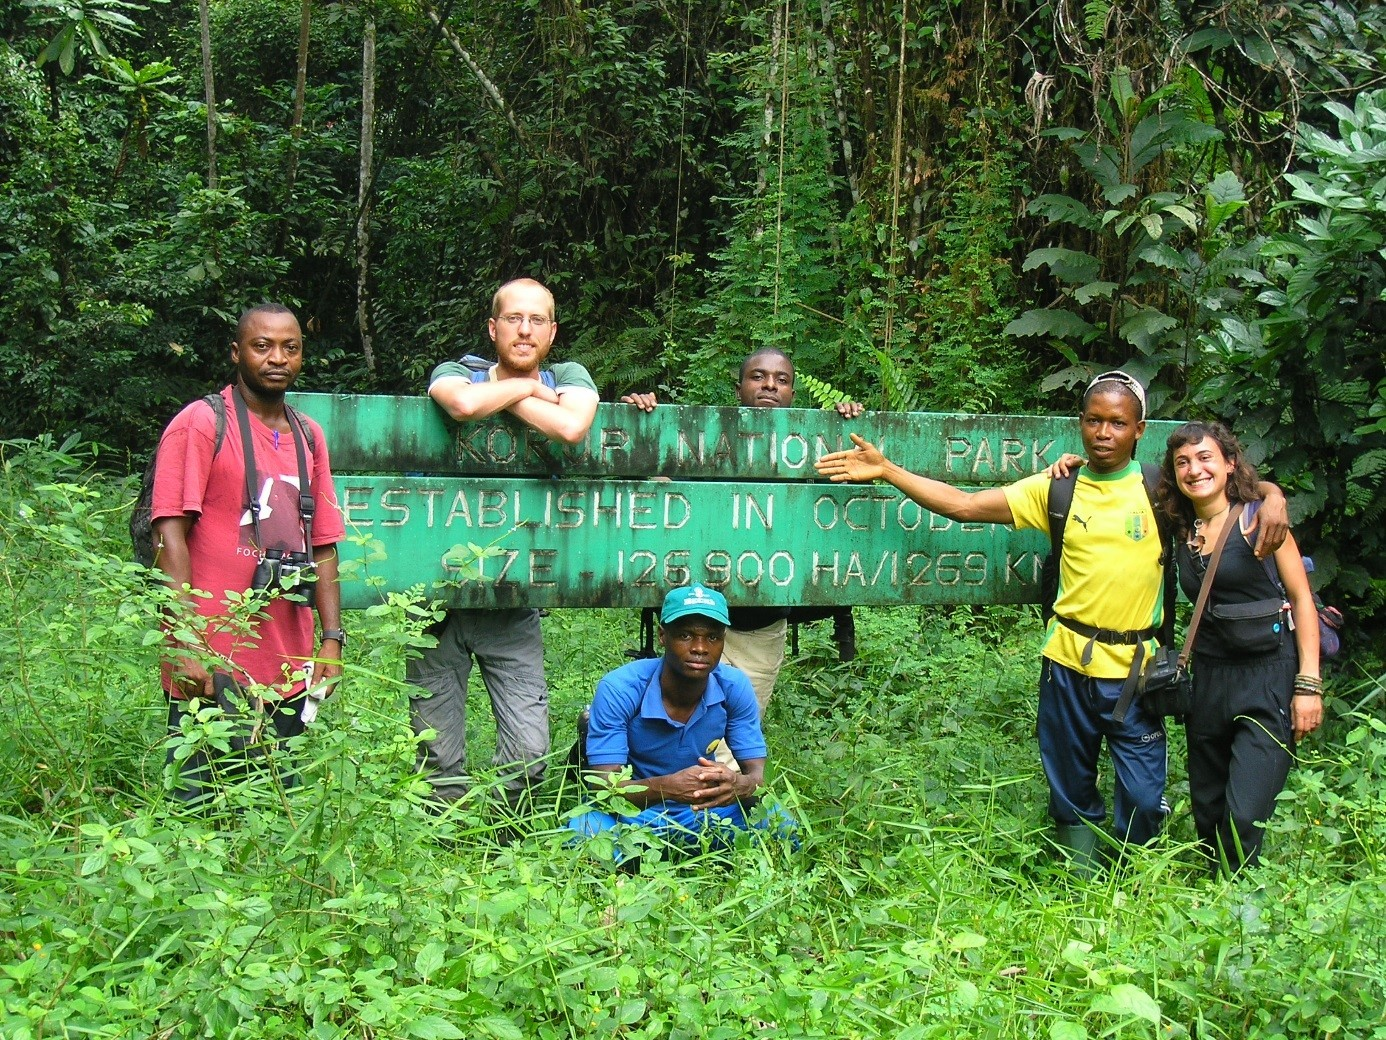 Autoren der Studie, Francis N. Motombi (1. v.l.), Denis Kupsch (2. v.l.) und Elleni Vendras (1. v.r.) mit Feldarbeitsteam am Eingang des Korup-Nationalpark, Südwestkamerun.